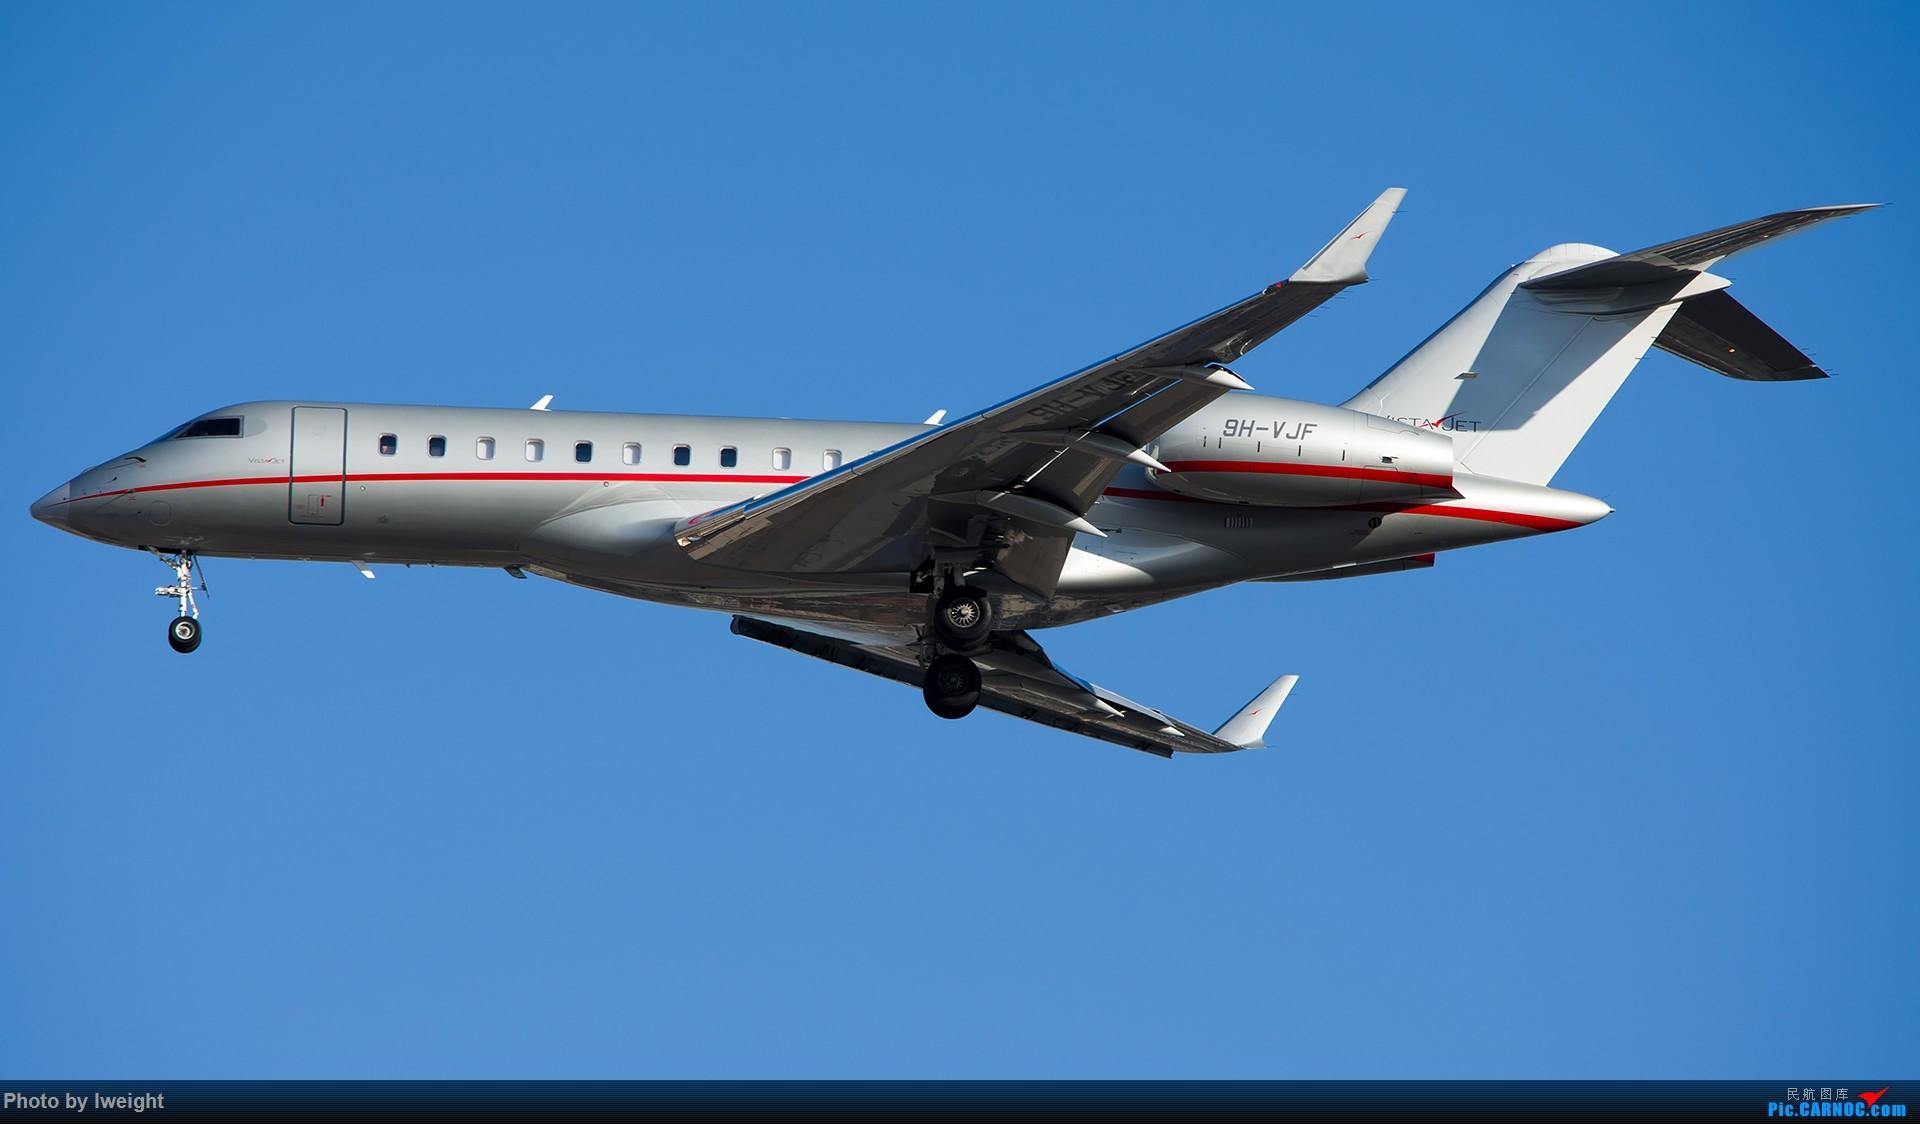 Re:[原创]终于在12月的北京等到了一个晴天的周末,出来拍拍飞机【2015-12-5】 BOMBARDIER BD-700-1A10 9H-VJF 中国北京首都国际机场